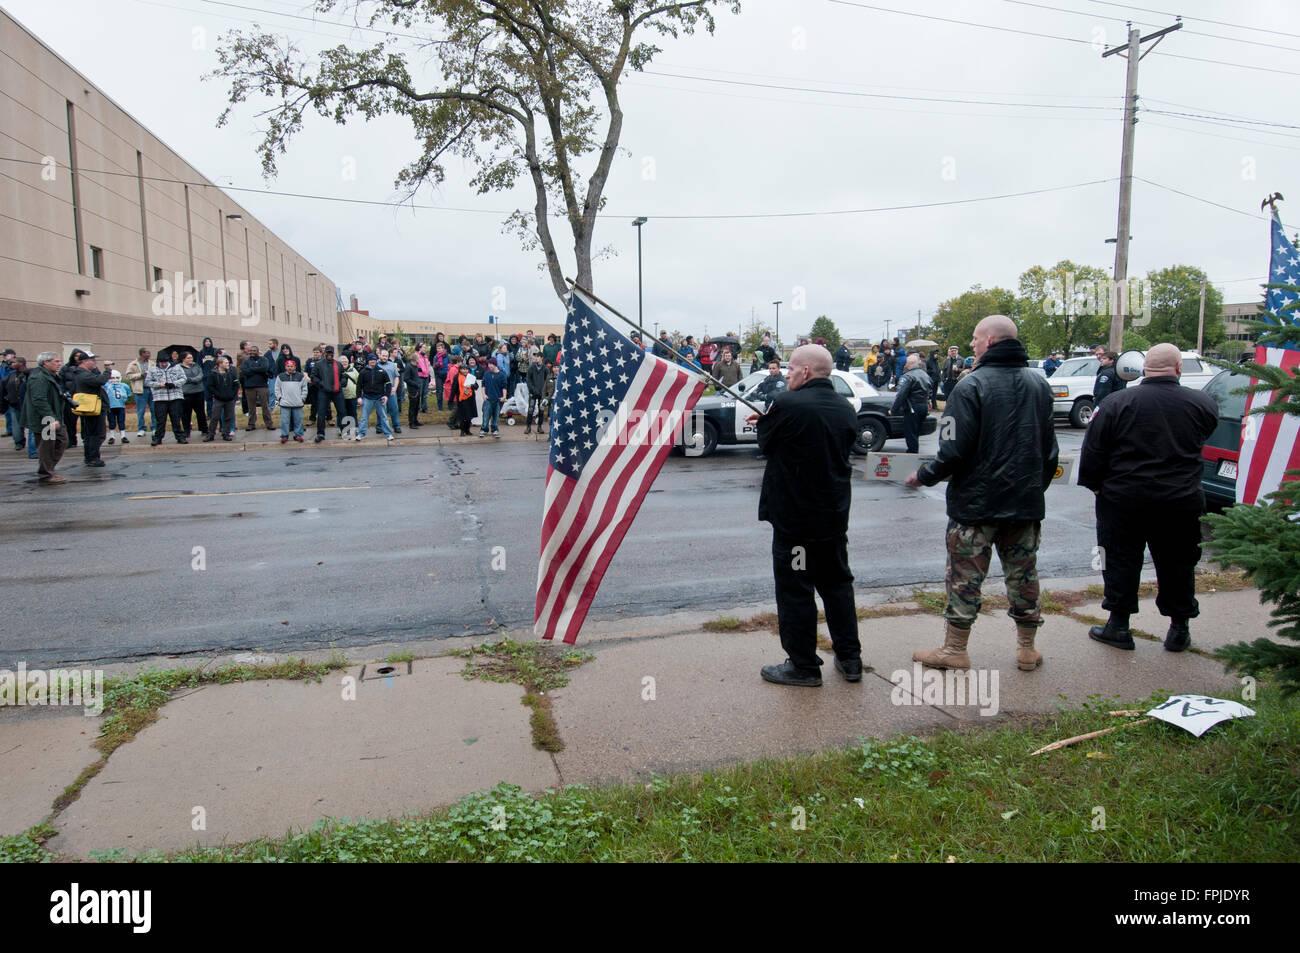 Minneapolis, Minnesota. Neo-Nazi rally. The Neo-Nazi National Socialist Movement demonstrating against an anti-racist - Stock Image